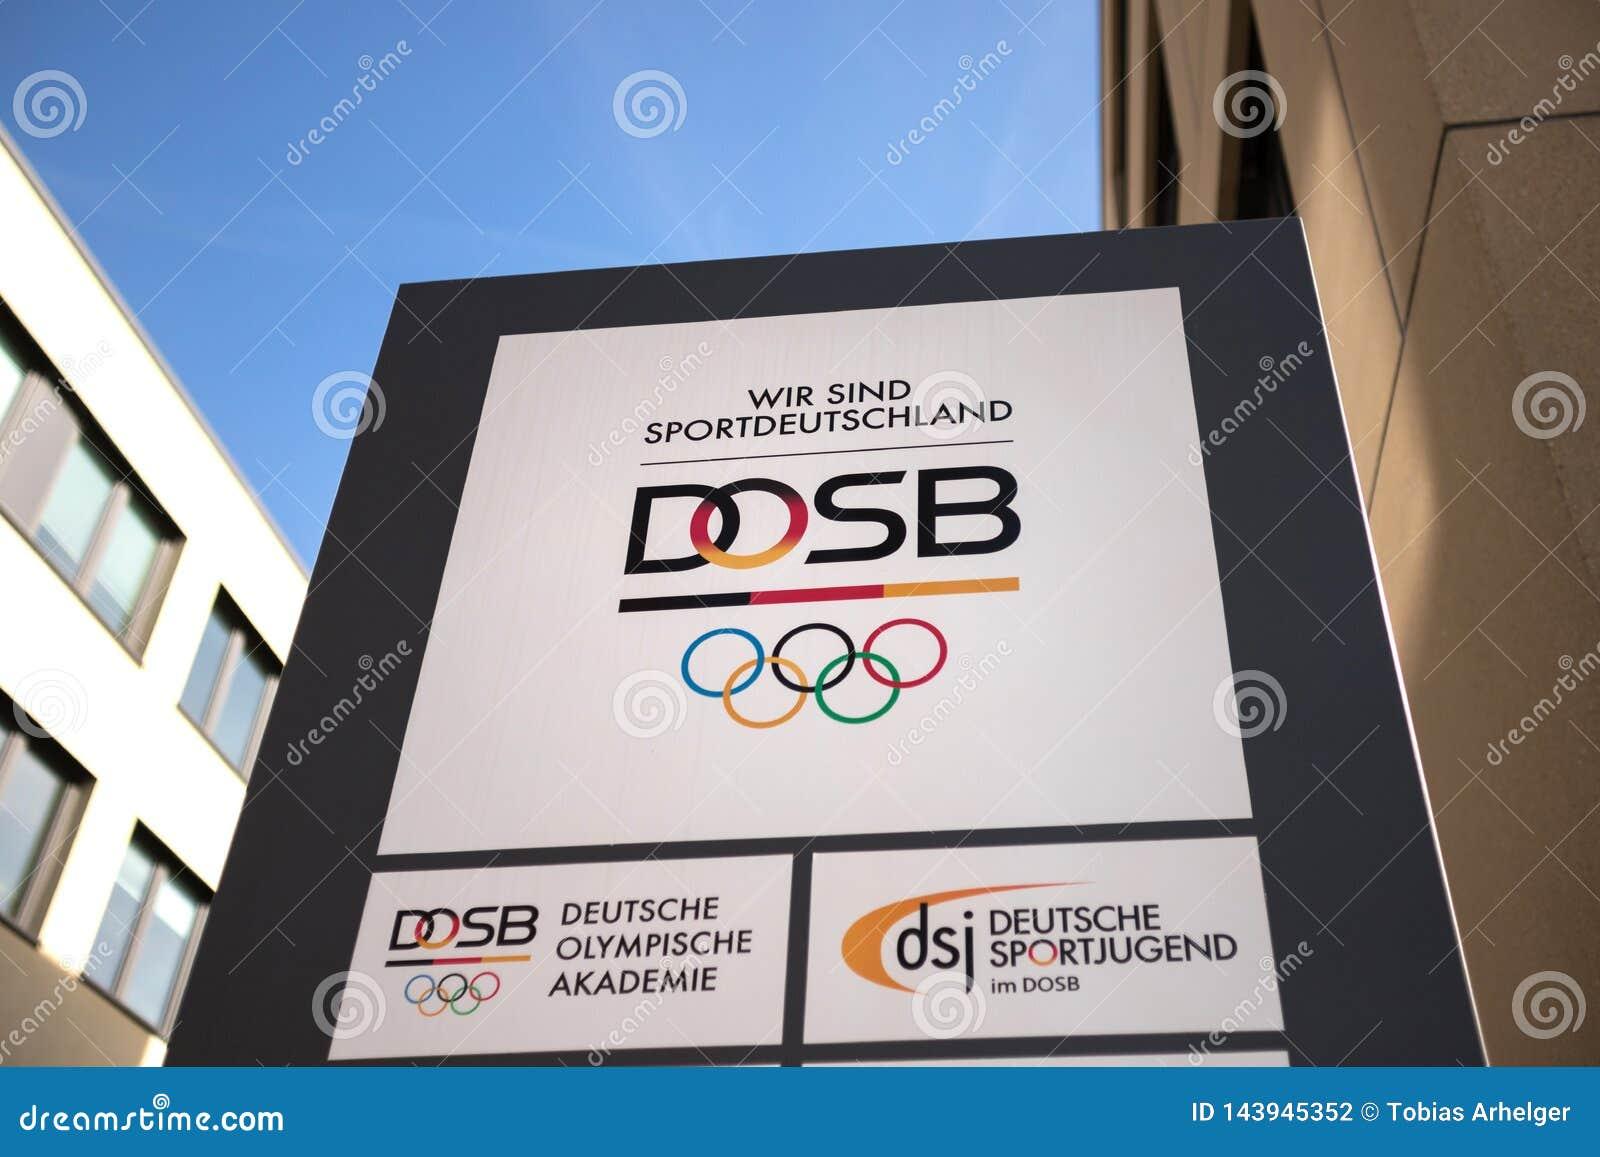 Frankfurt, hesse/germany - 22 03 19: dosb sign in frankfurt germany